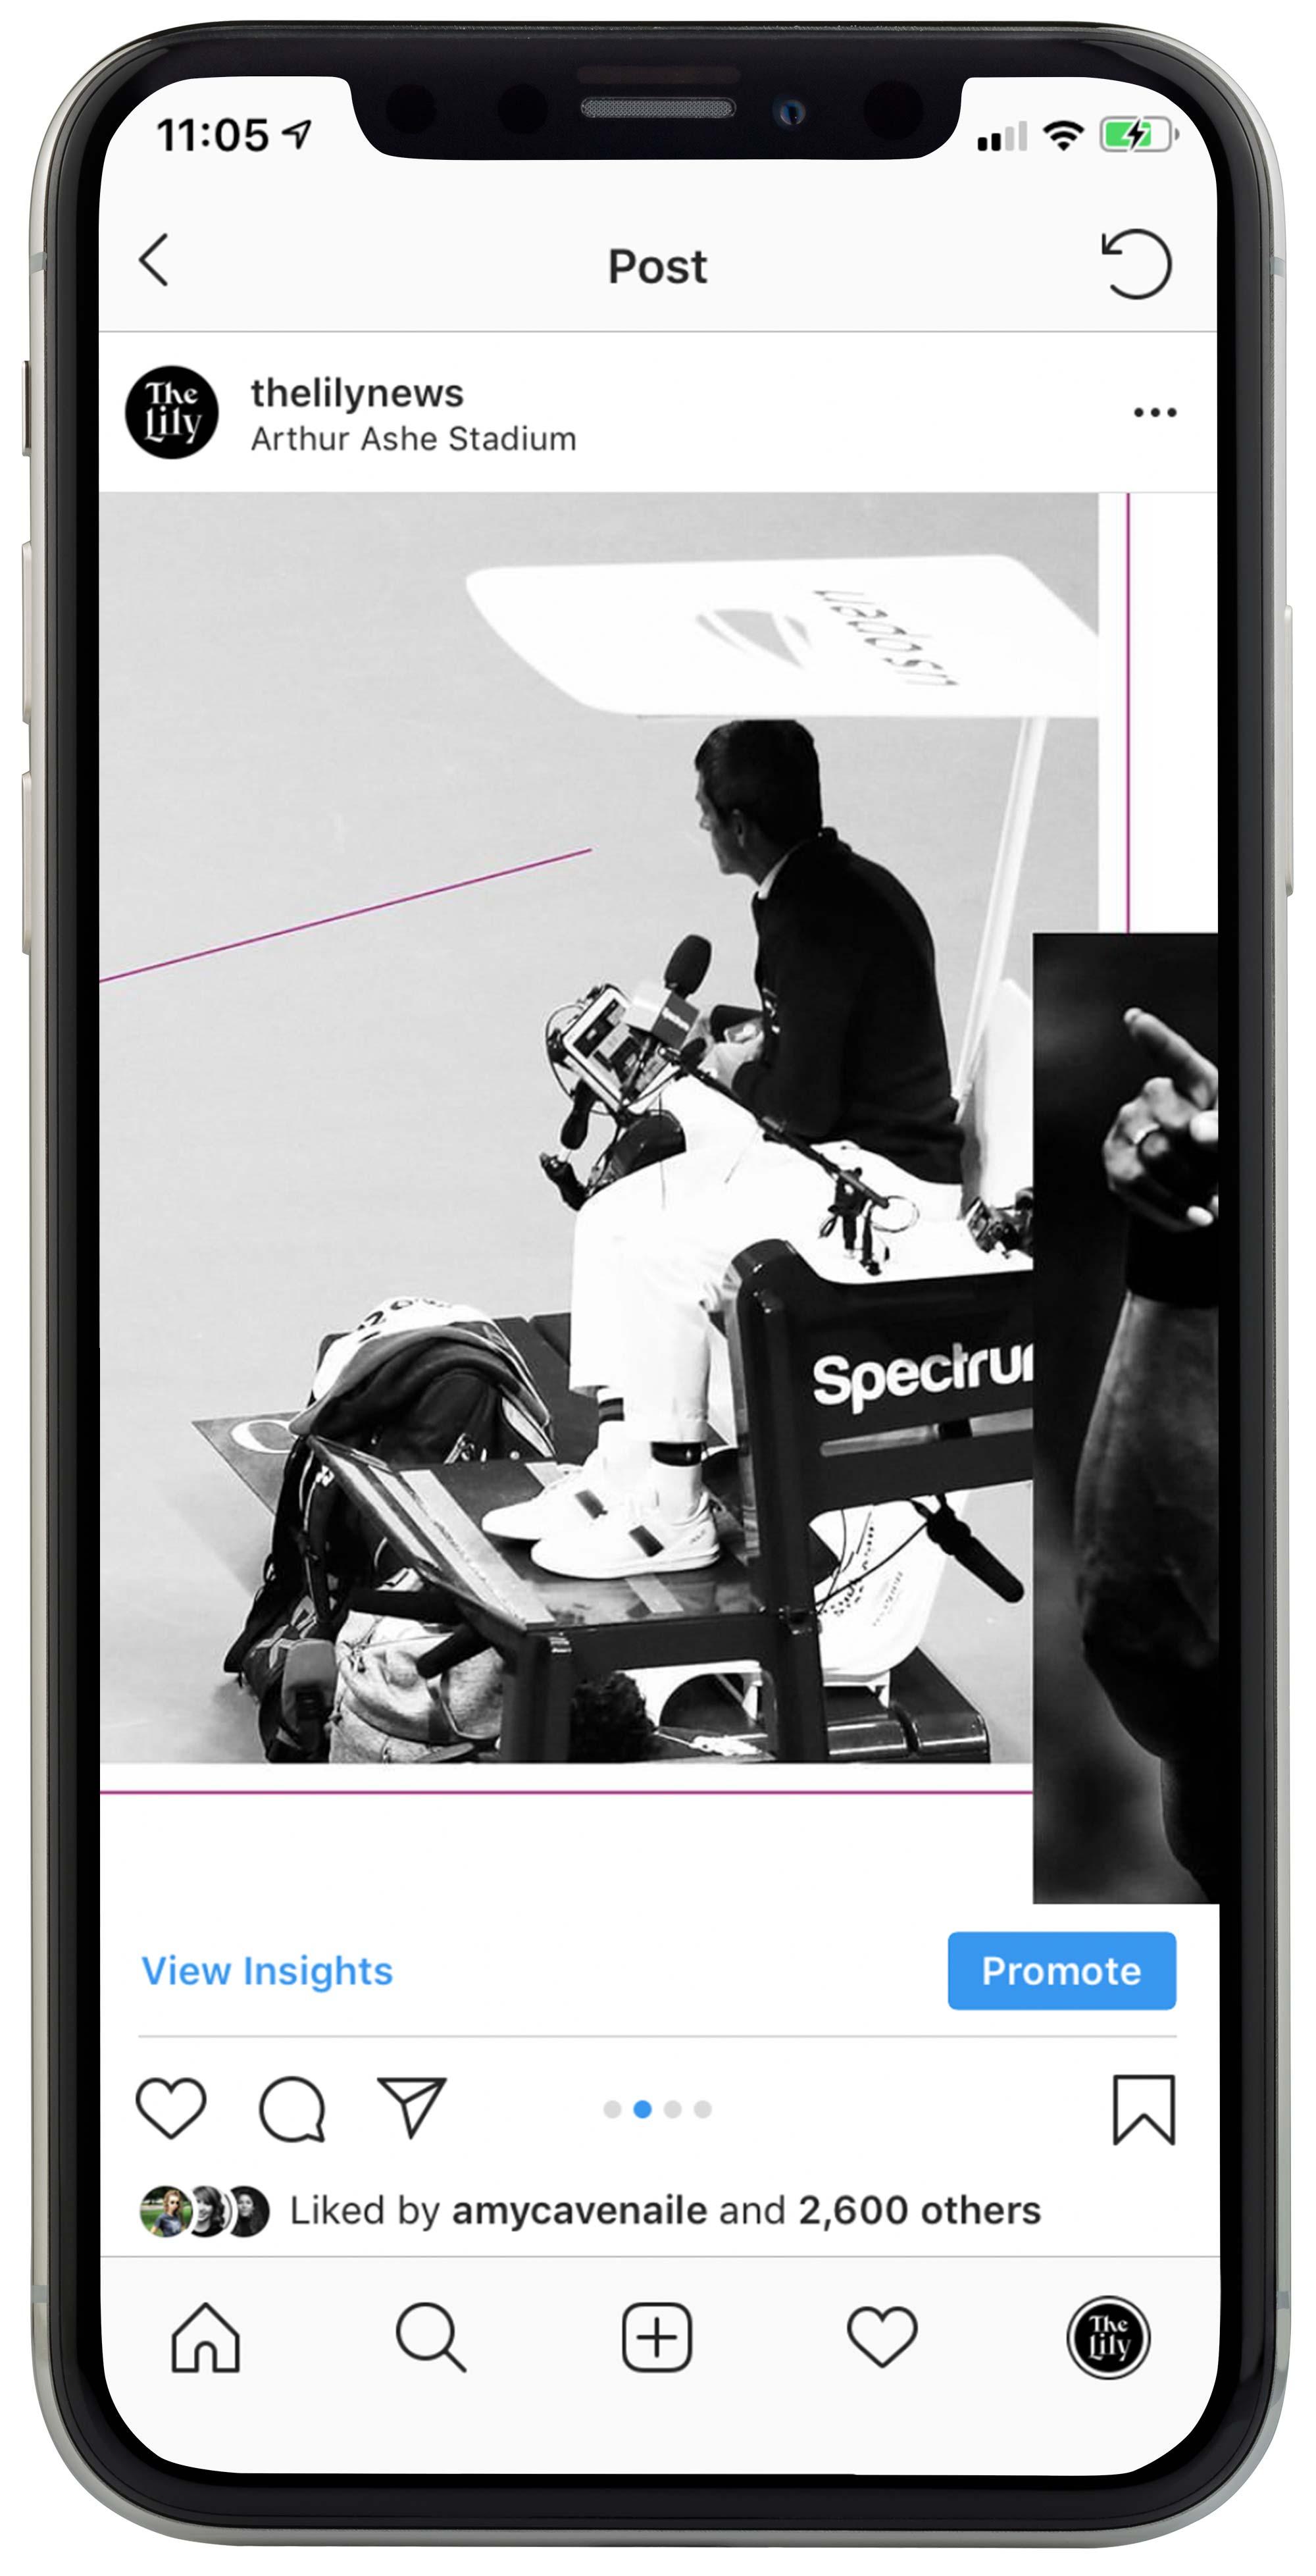 IGProper-Serena02.jpg